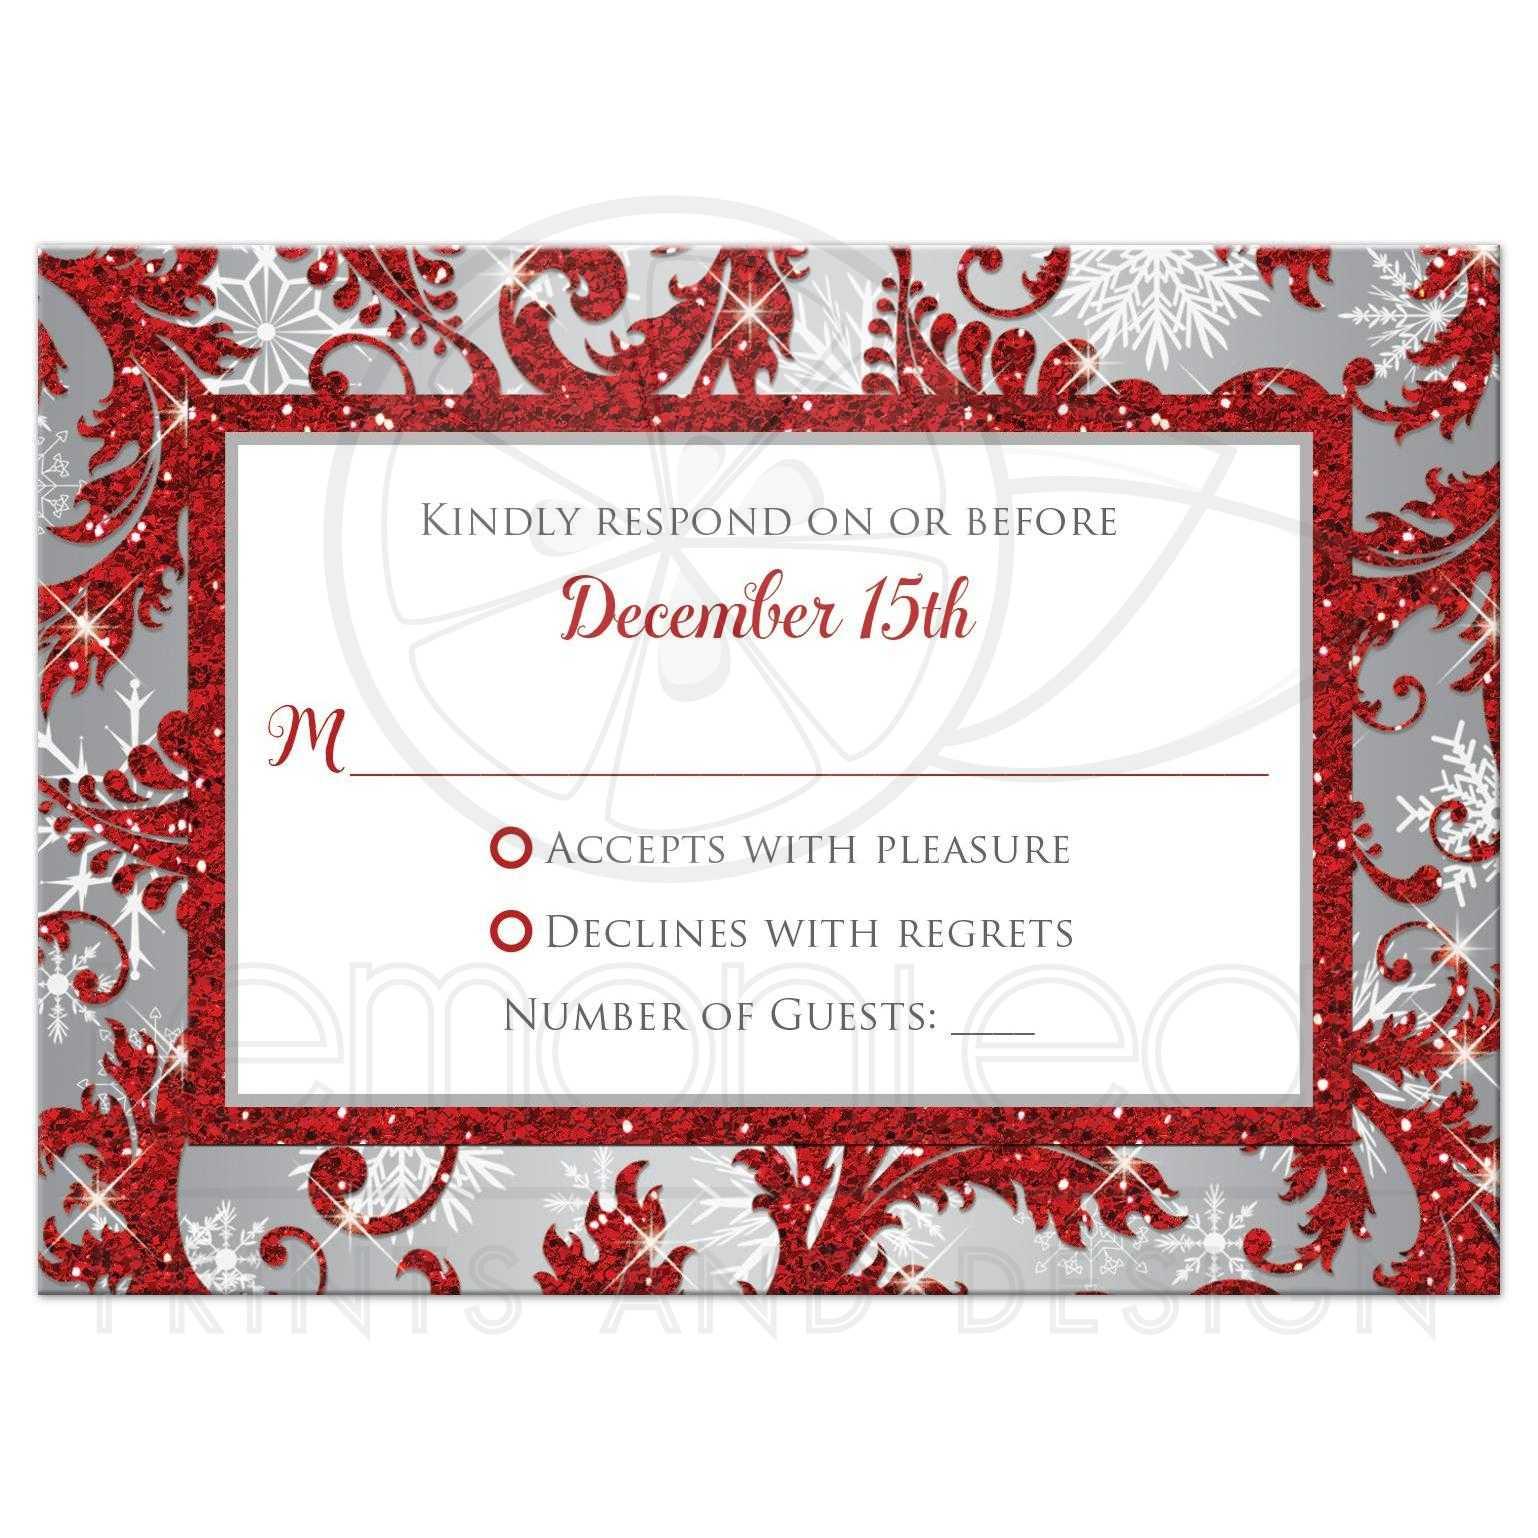 Wedding Reponse Card   Red Winter Wonderland   Silver, White ...